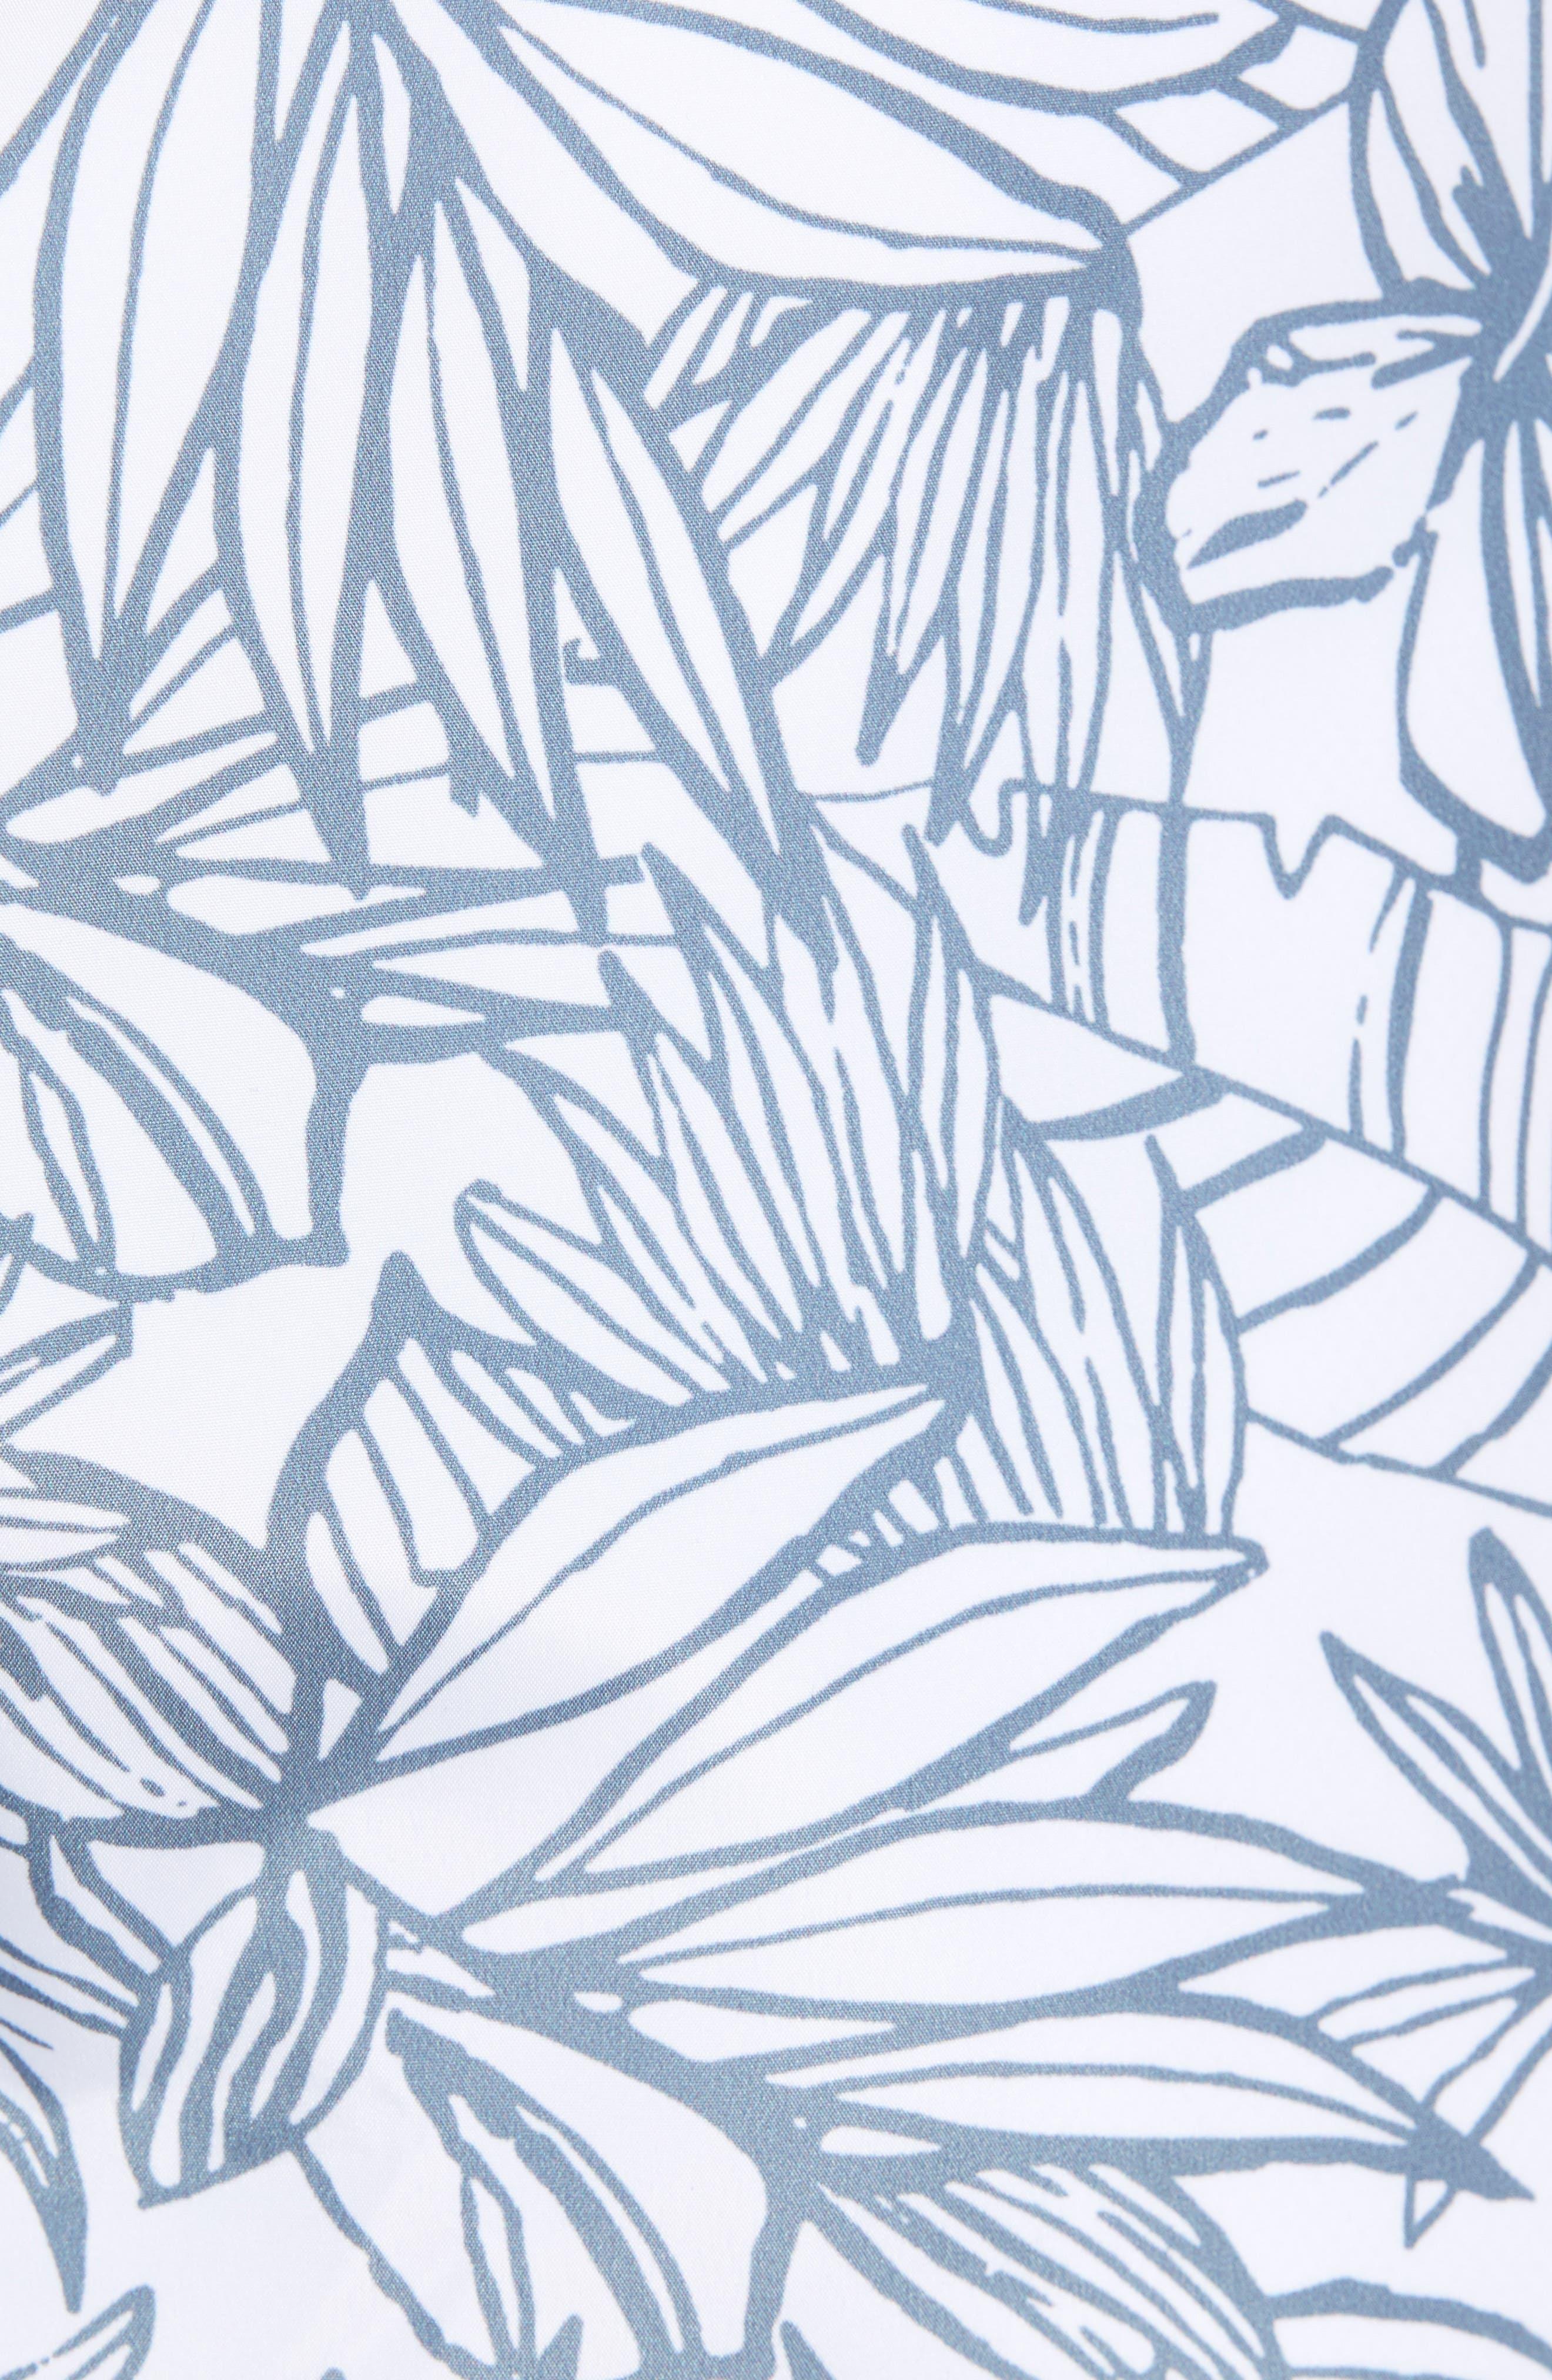 Needlefish Palm Swim Trunks,                             Alternate thumbnail 5, color,                             White